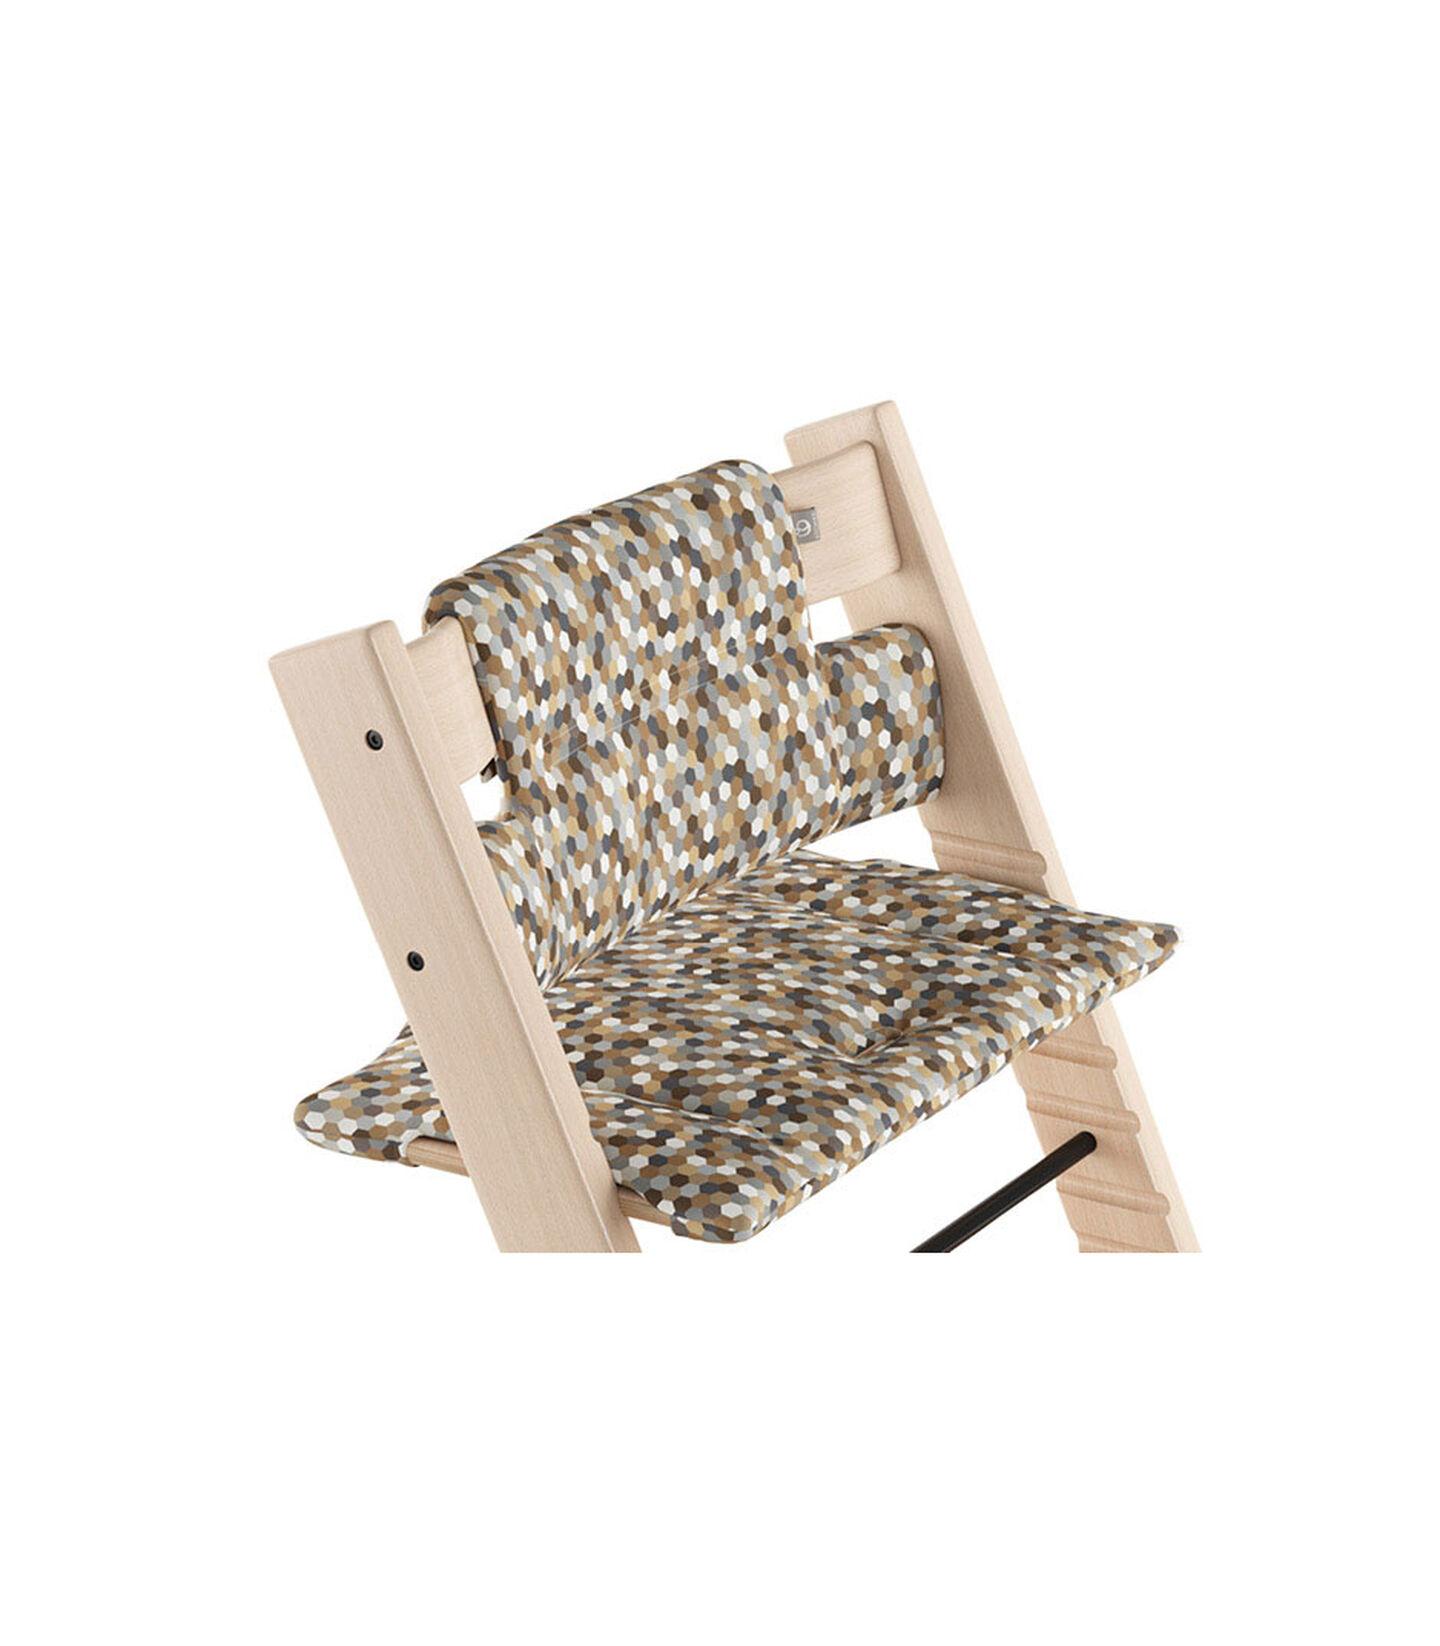 Tripp Trapp® Classic Cushion Honeycomb Calm OCS, Ingetogen honingraatmotief, mainview view 2